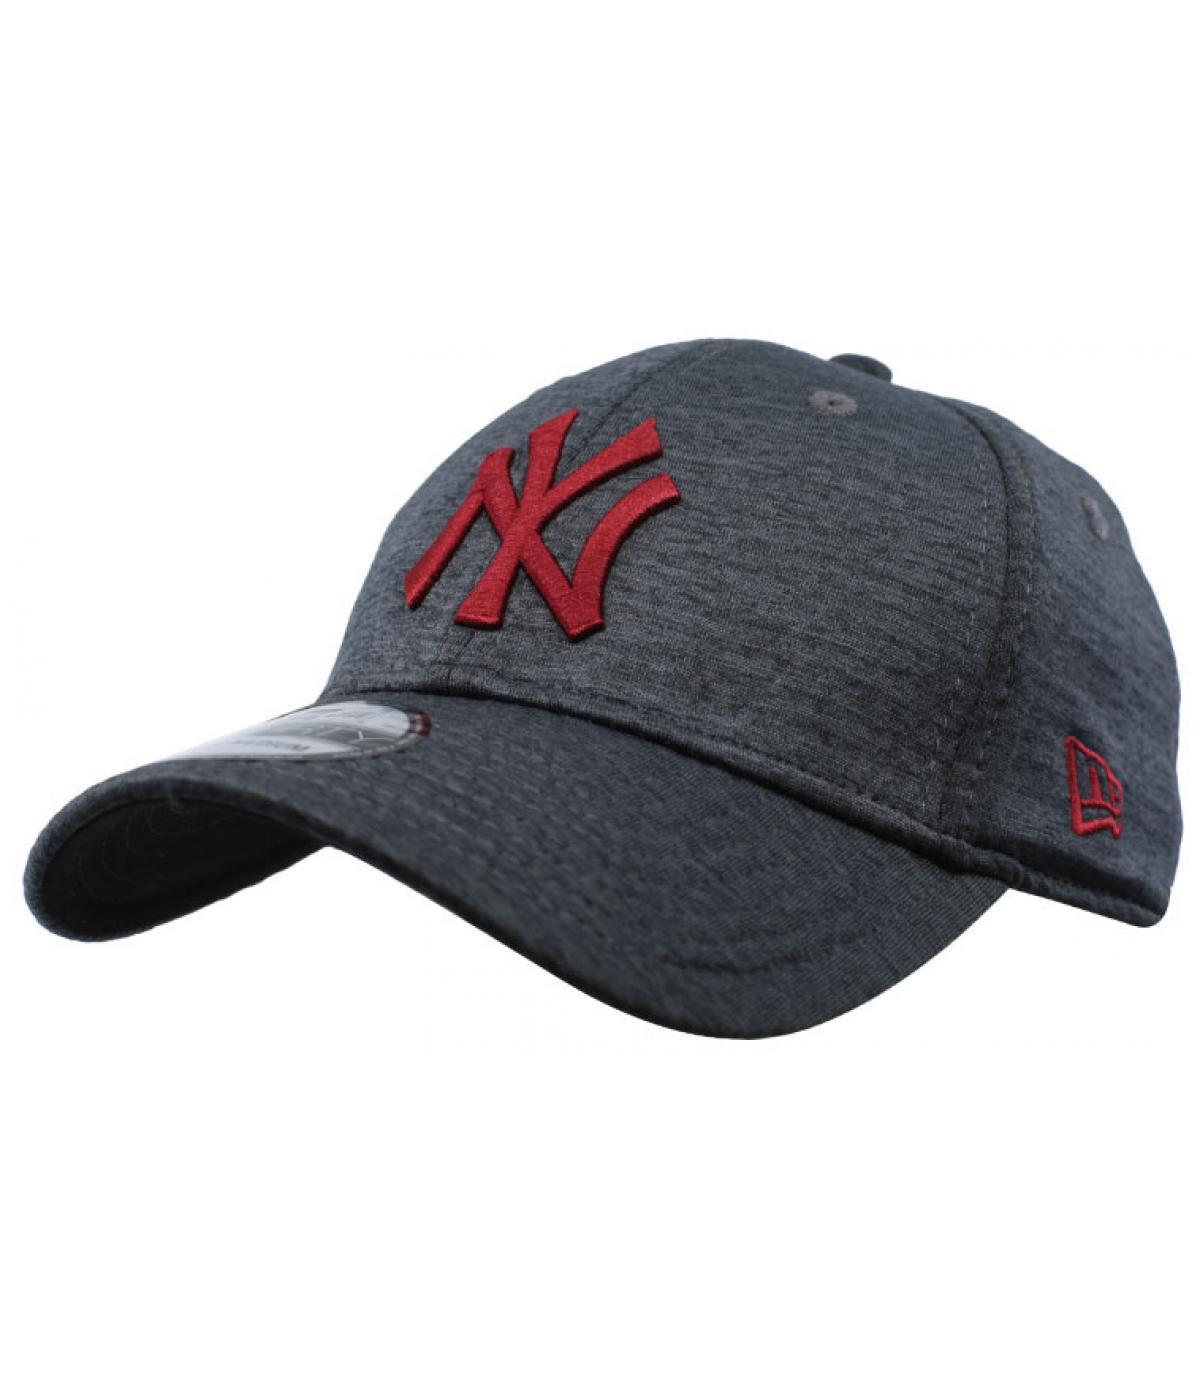 996bff646f4c black grey NY cap - NY Dryswitch Jersey 39Thirty black cardinal by ...